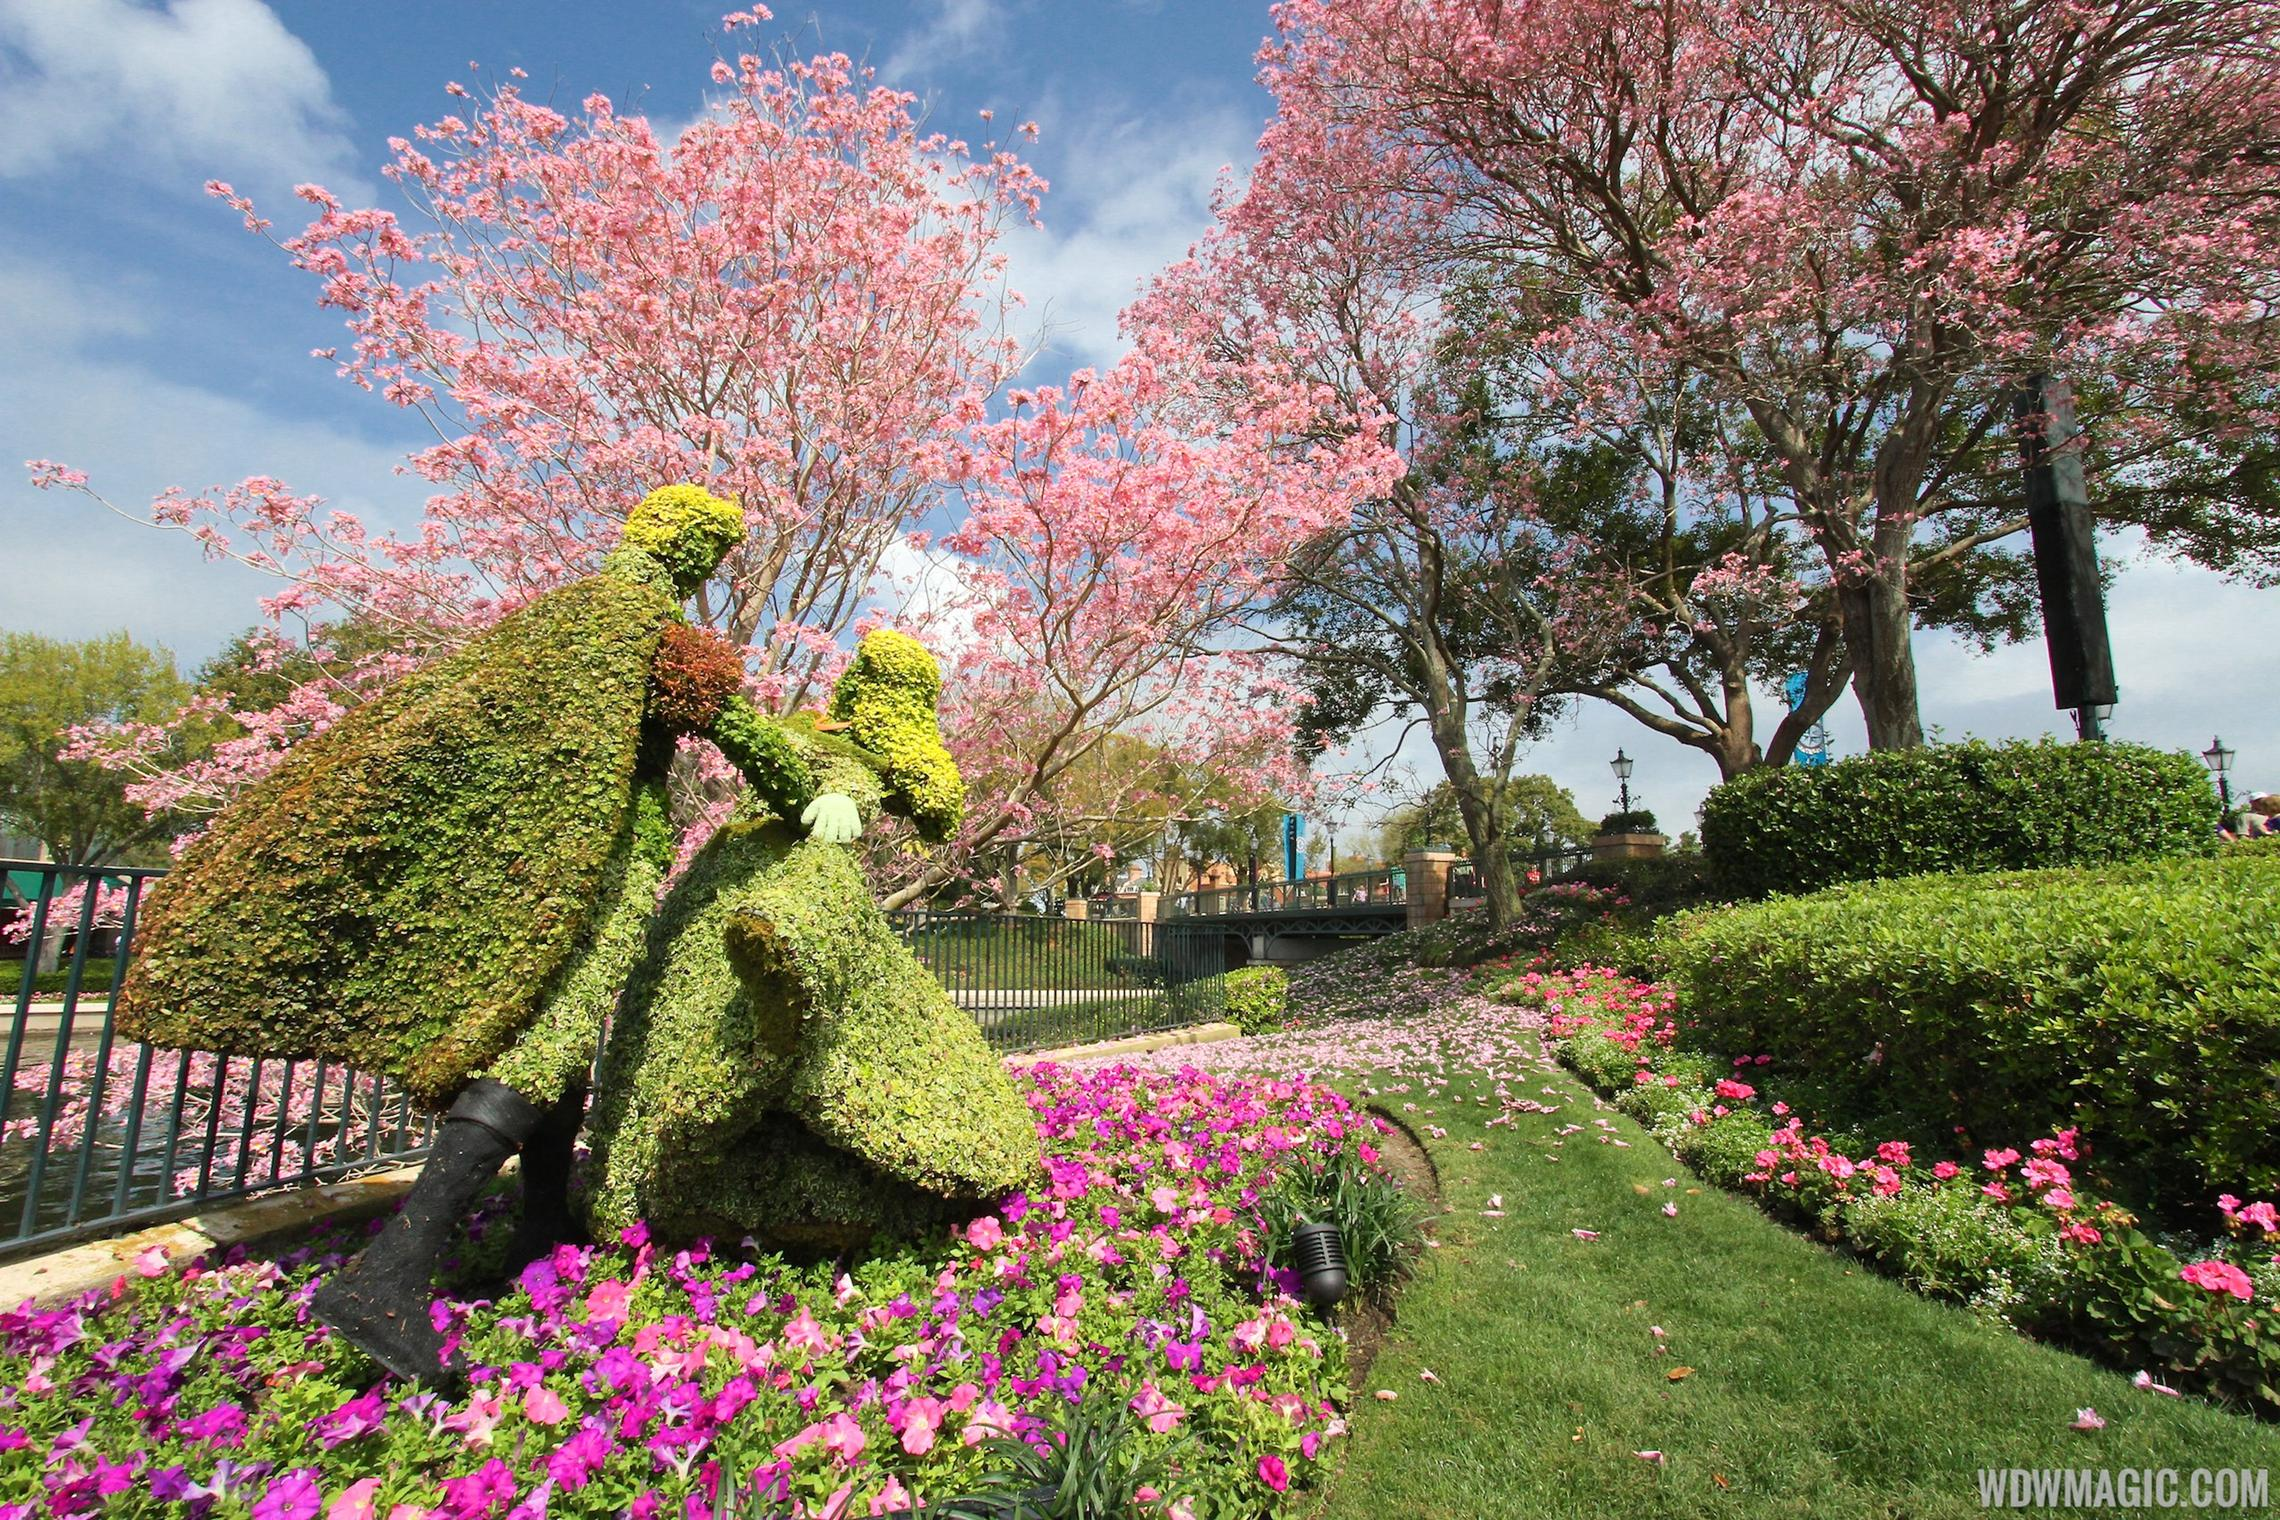 2014 Epcot Flower and Garden Festival